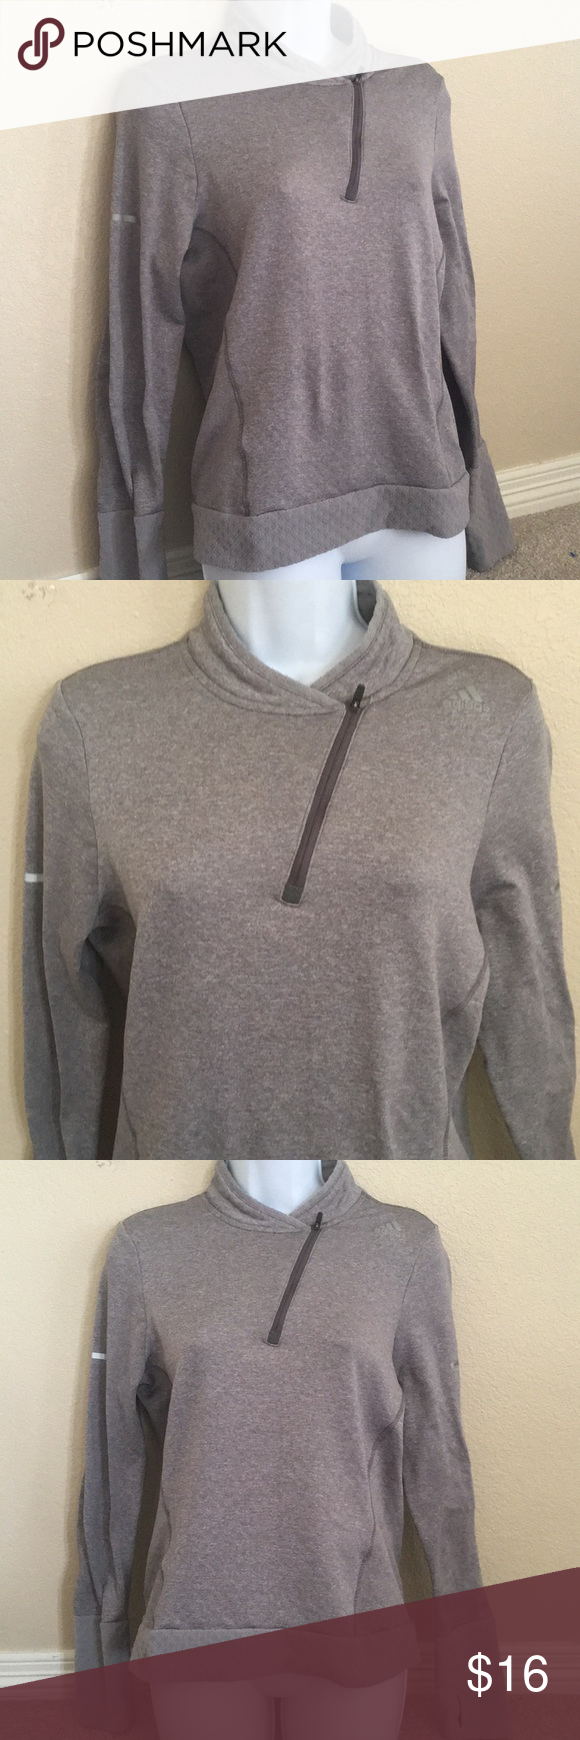 Predownload: Adidas Climaheat Running 1 4 Zip Adidas Running Adidas Tops Sweatshirts Hoodie [ 1740 x 580 Pixel ]